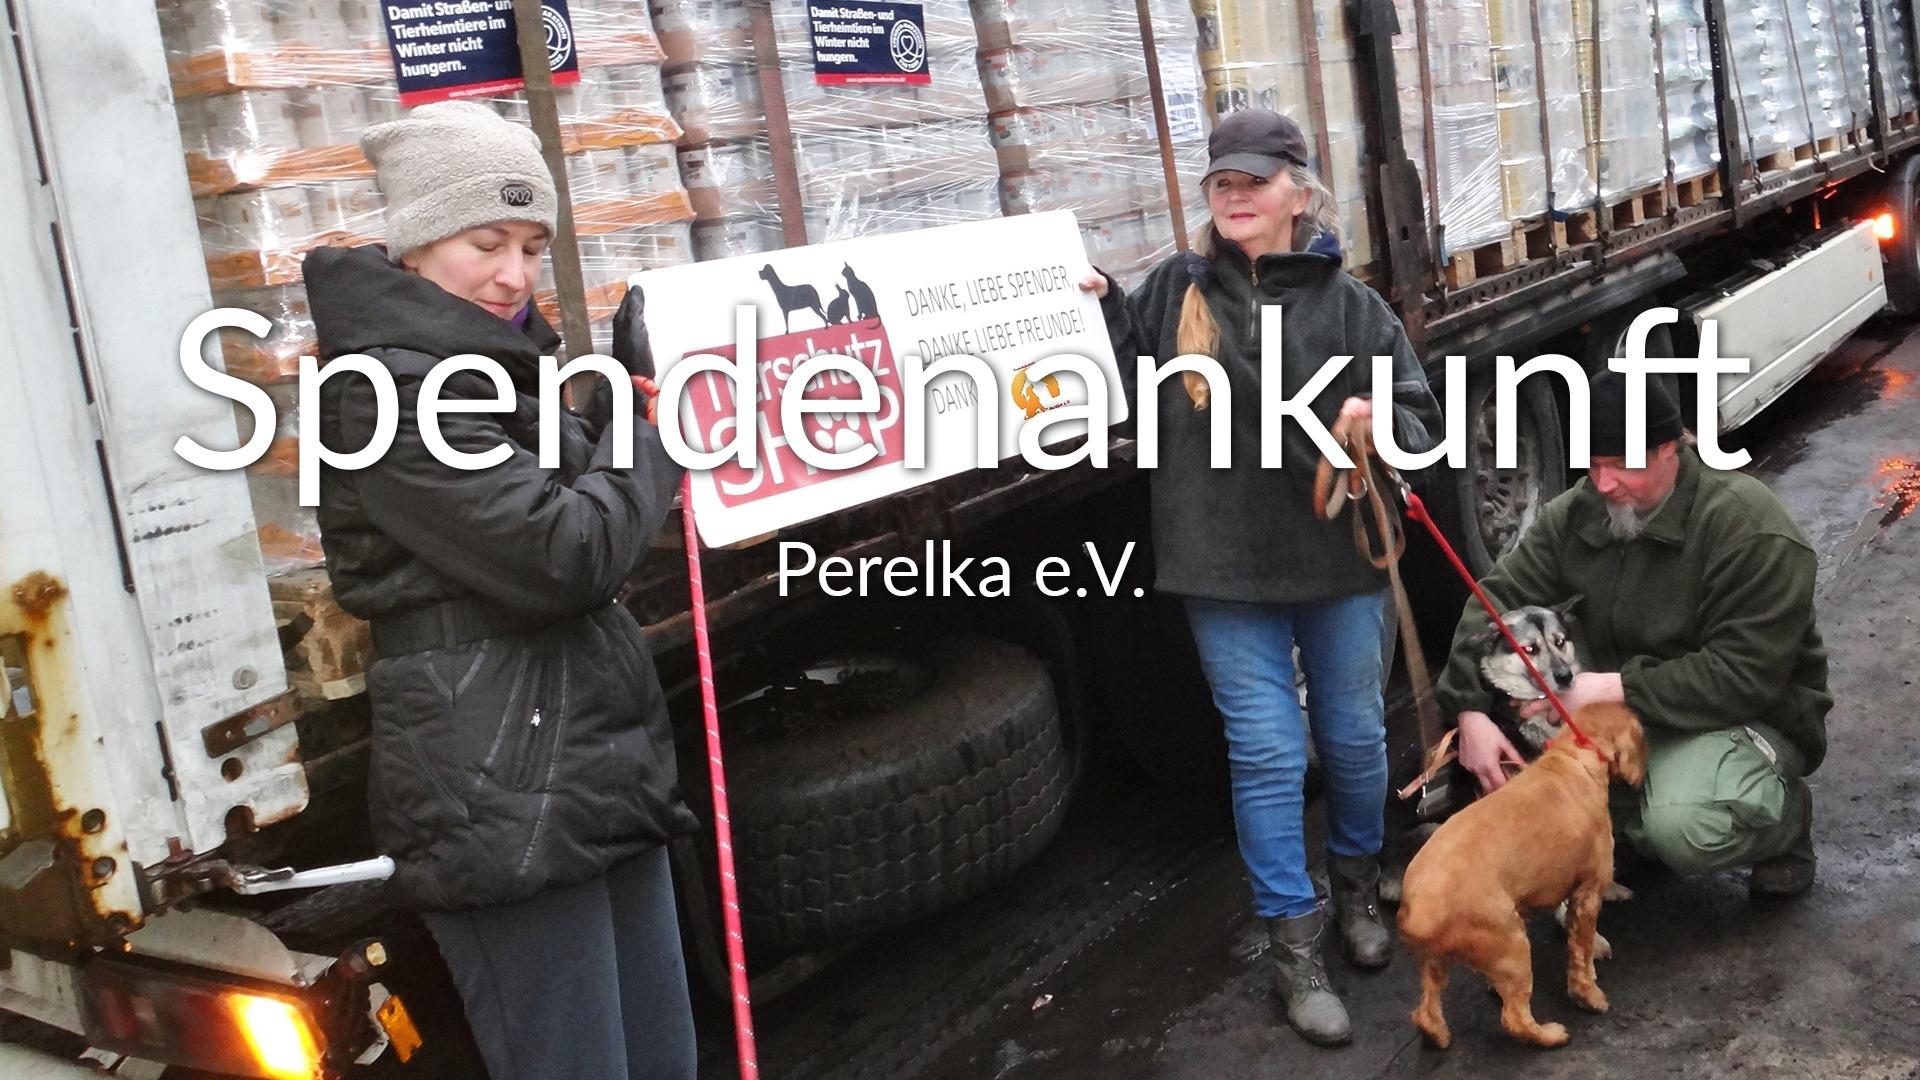 Perelka e.V.-Futterspendenankunft-maerz-2020-Spenden-Marathon-2019-Polen-VIDEO